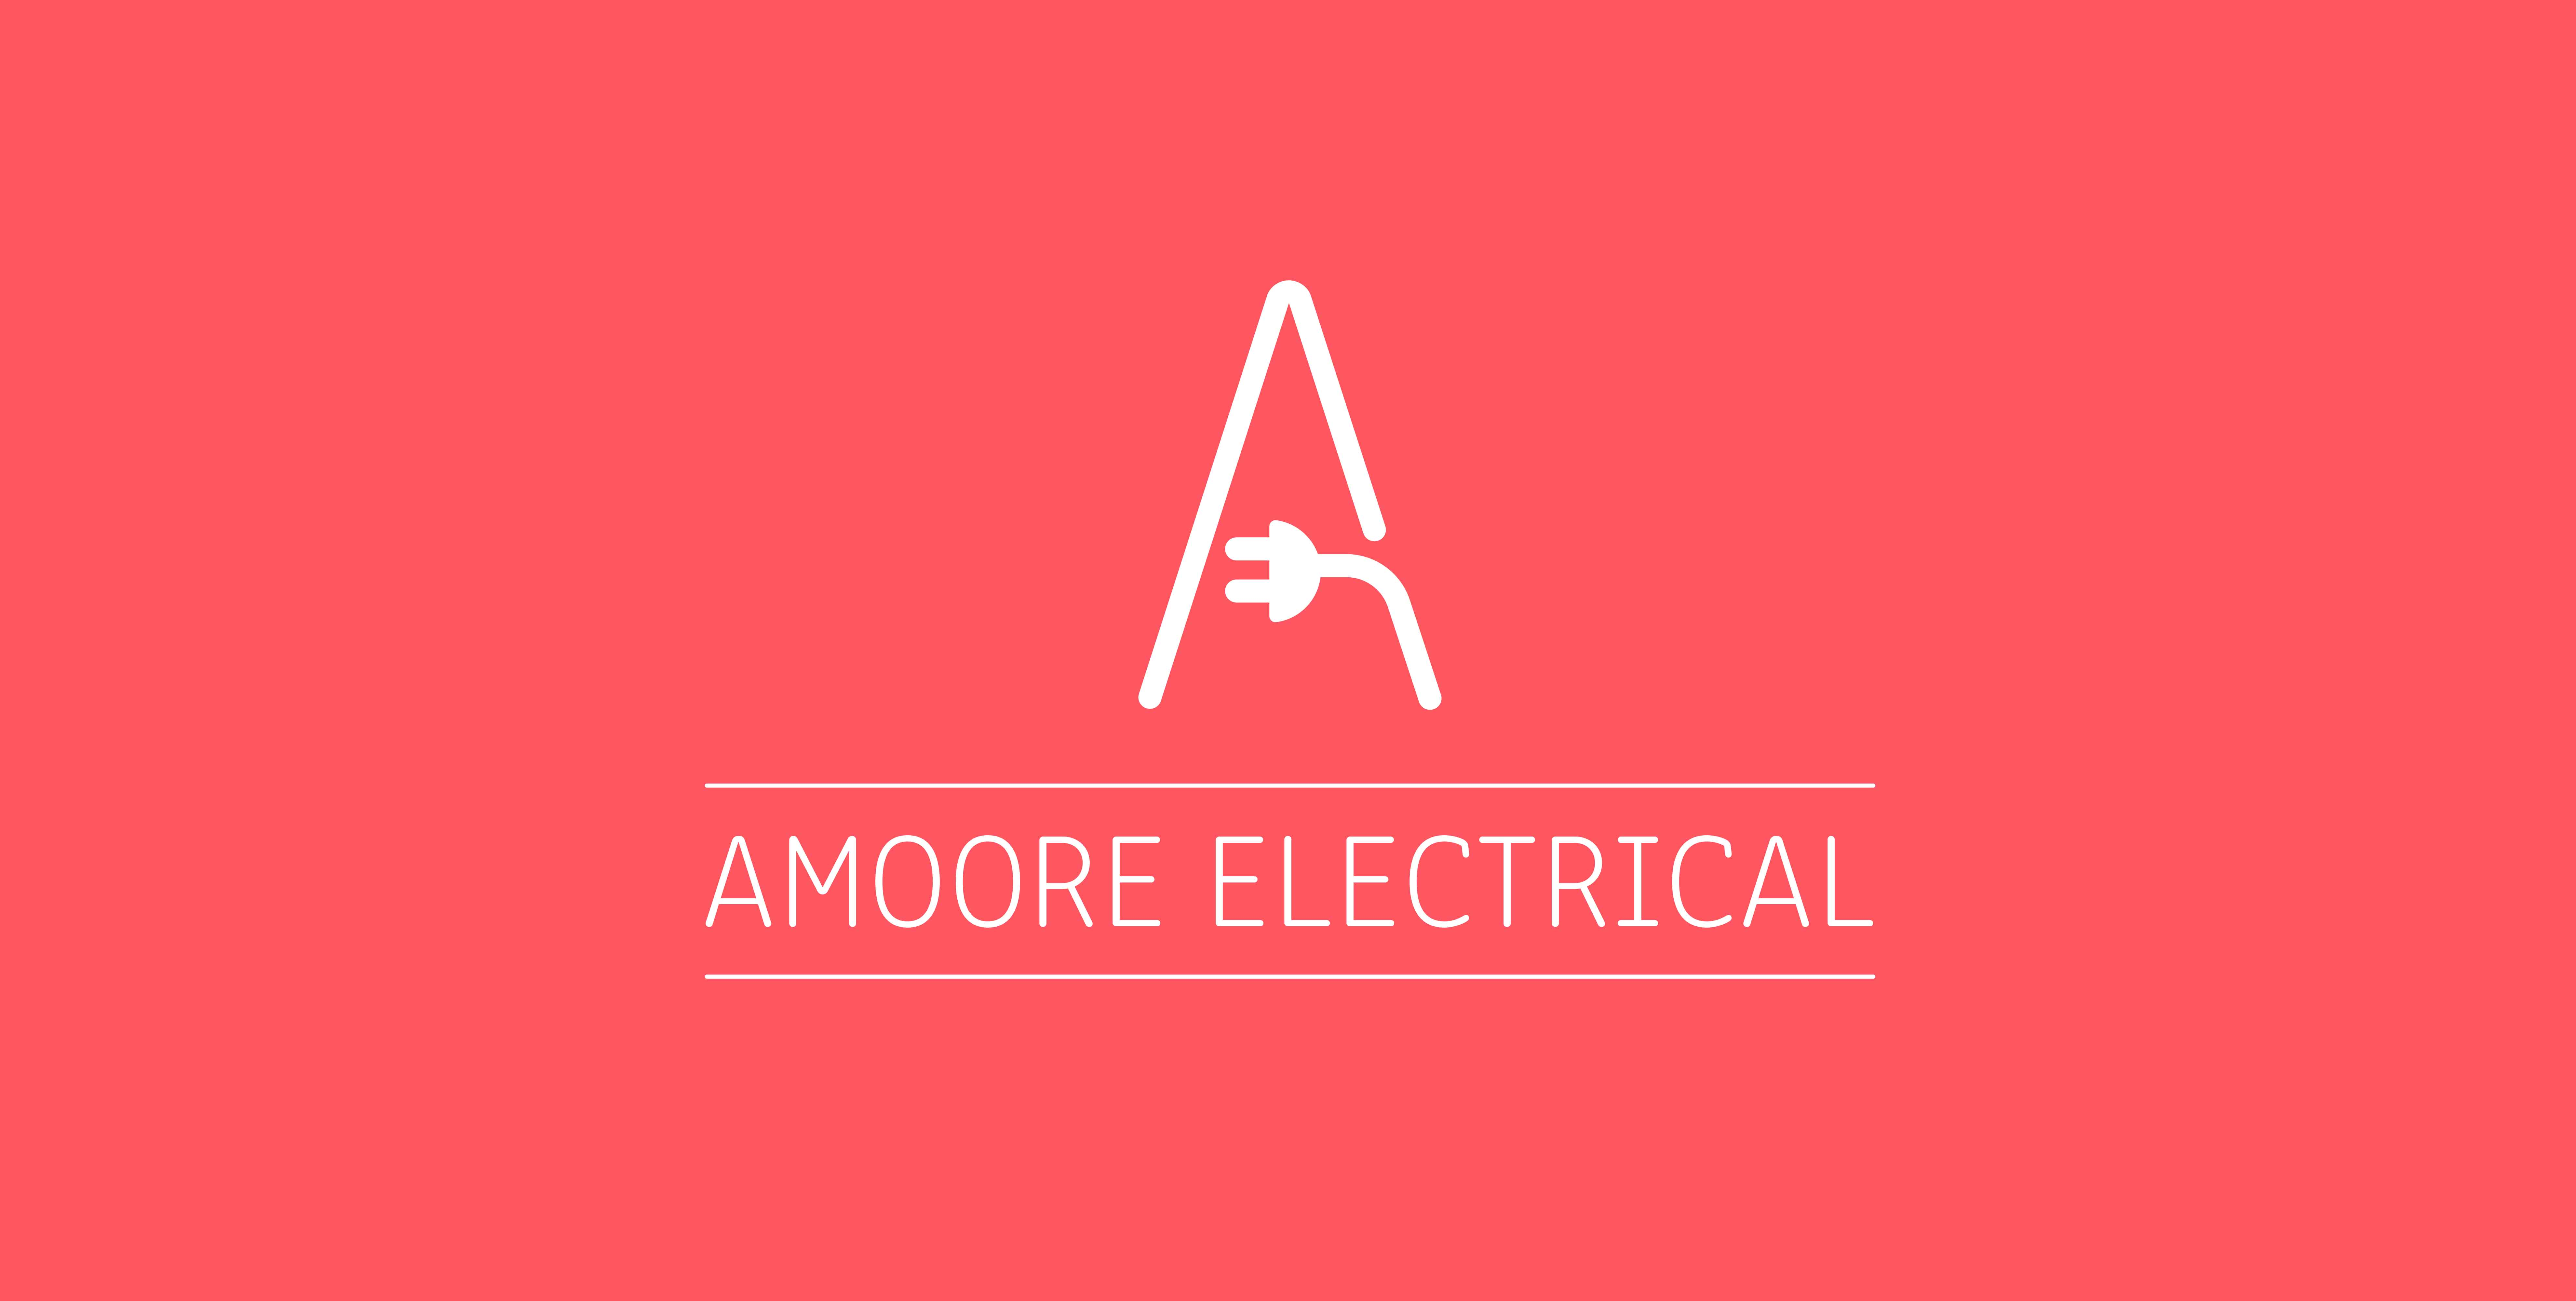 Amoore Electrical Branding